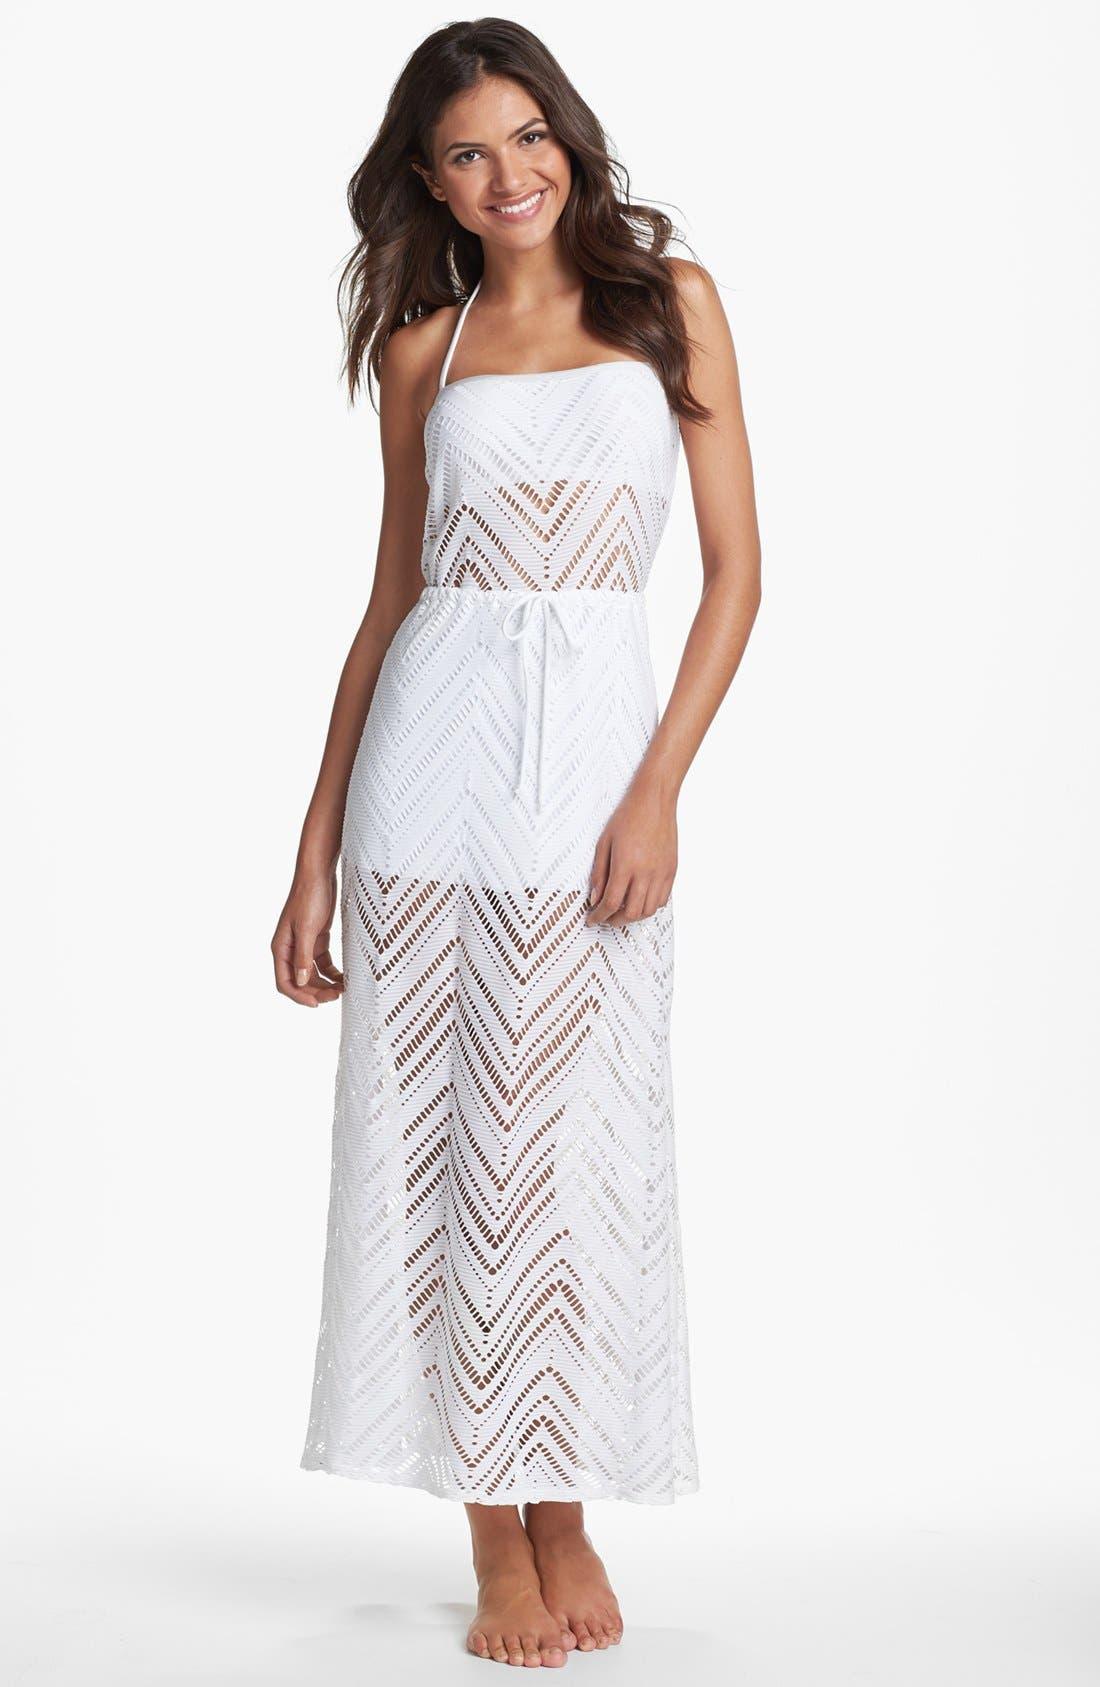 Main Image - Robin Piccone Crochet Overlay Cover-Up Dress